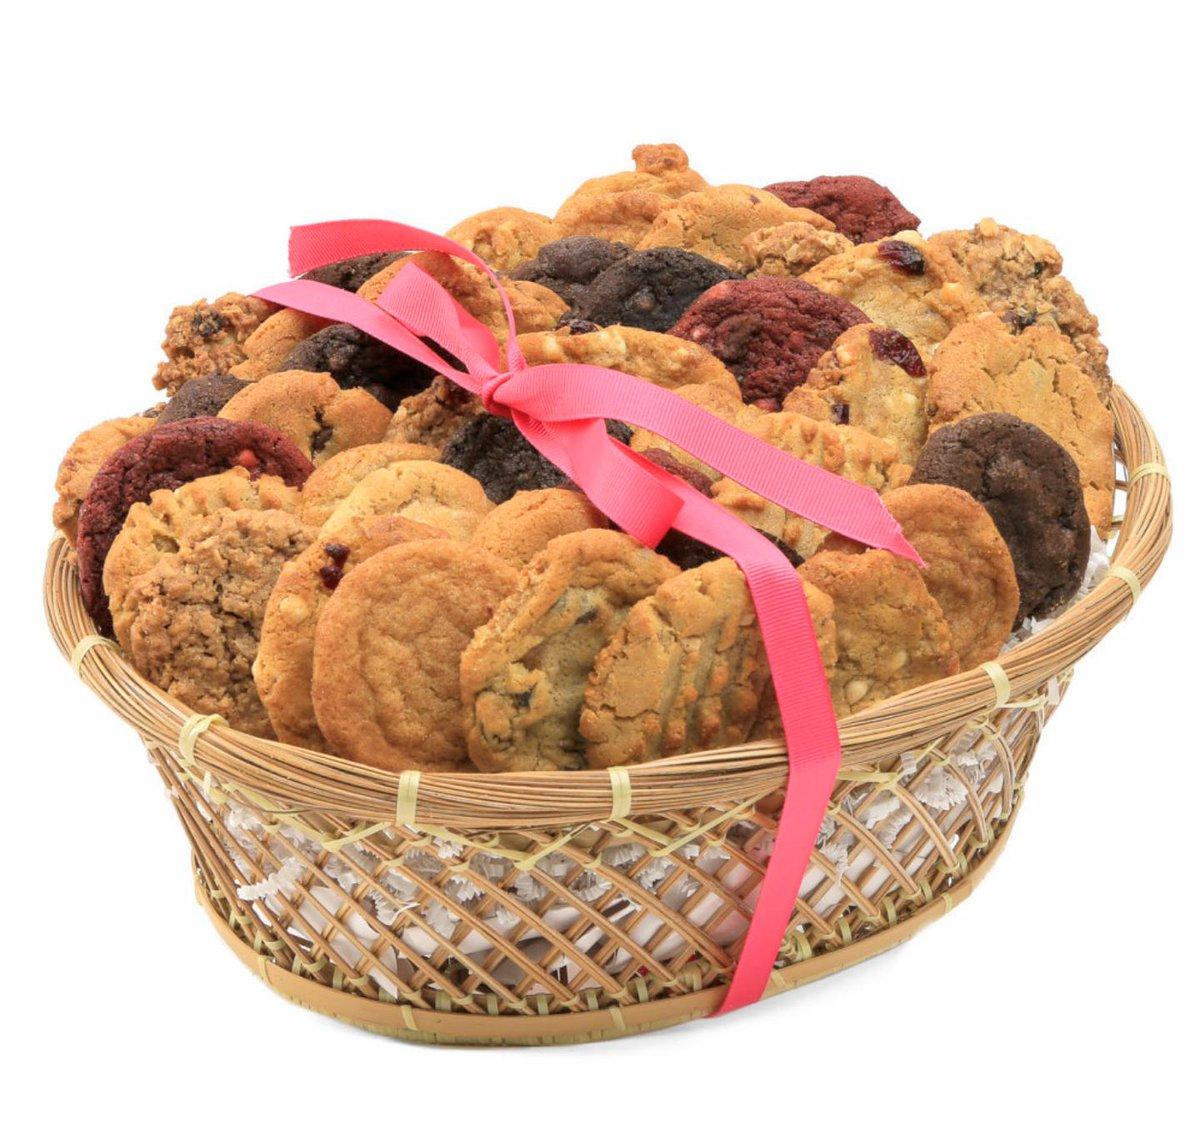 Sweet Temptations Basket